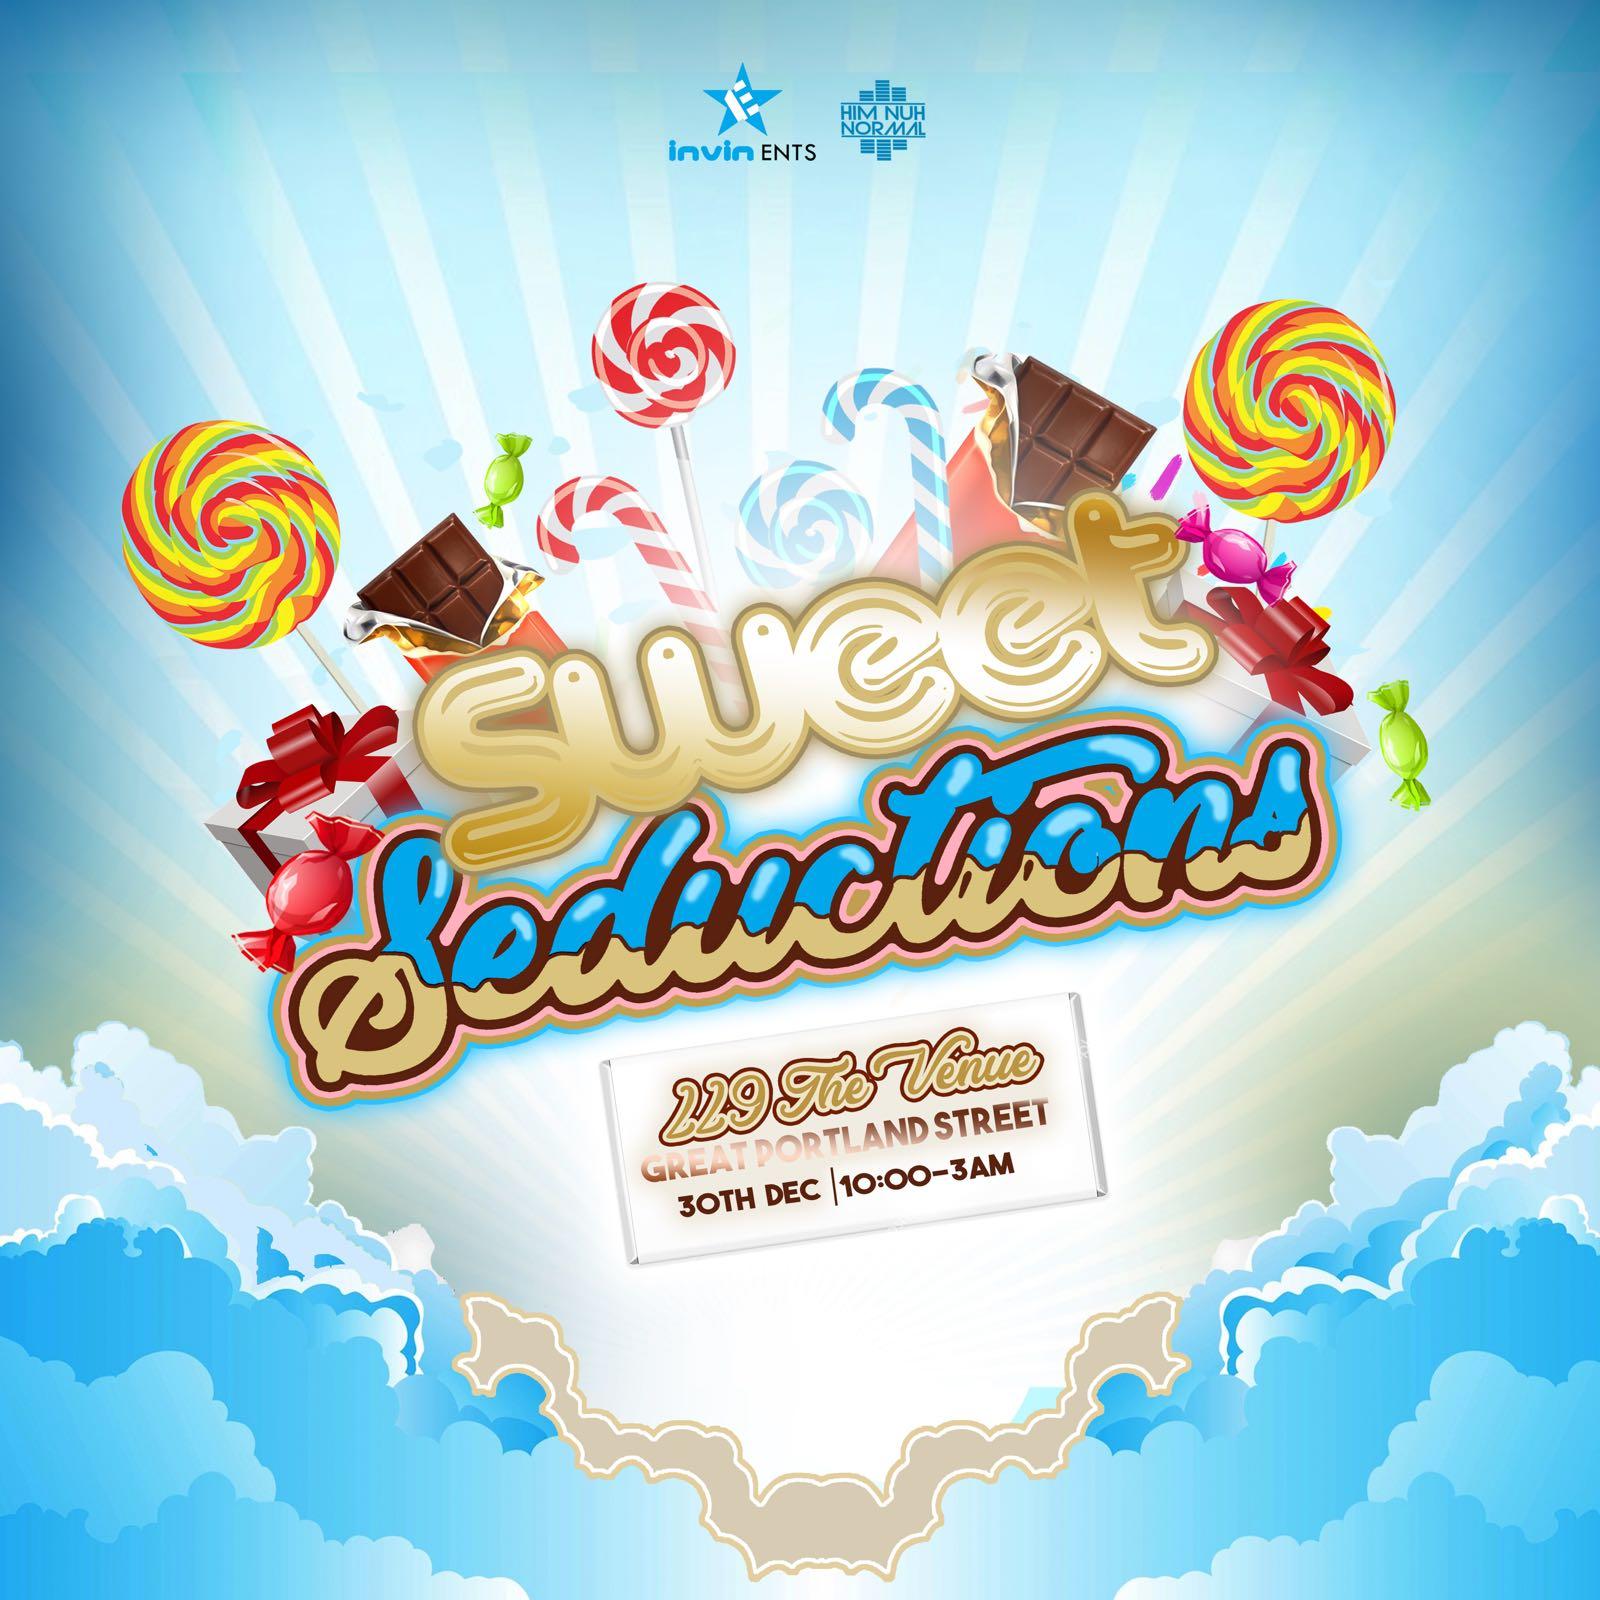 #SweetSeductions